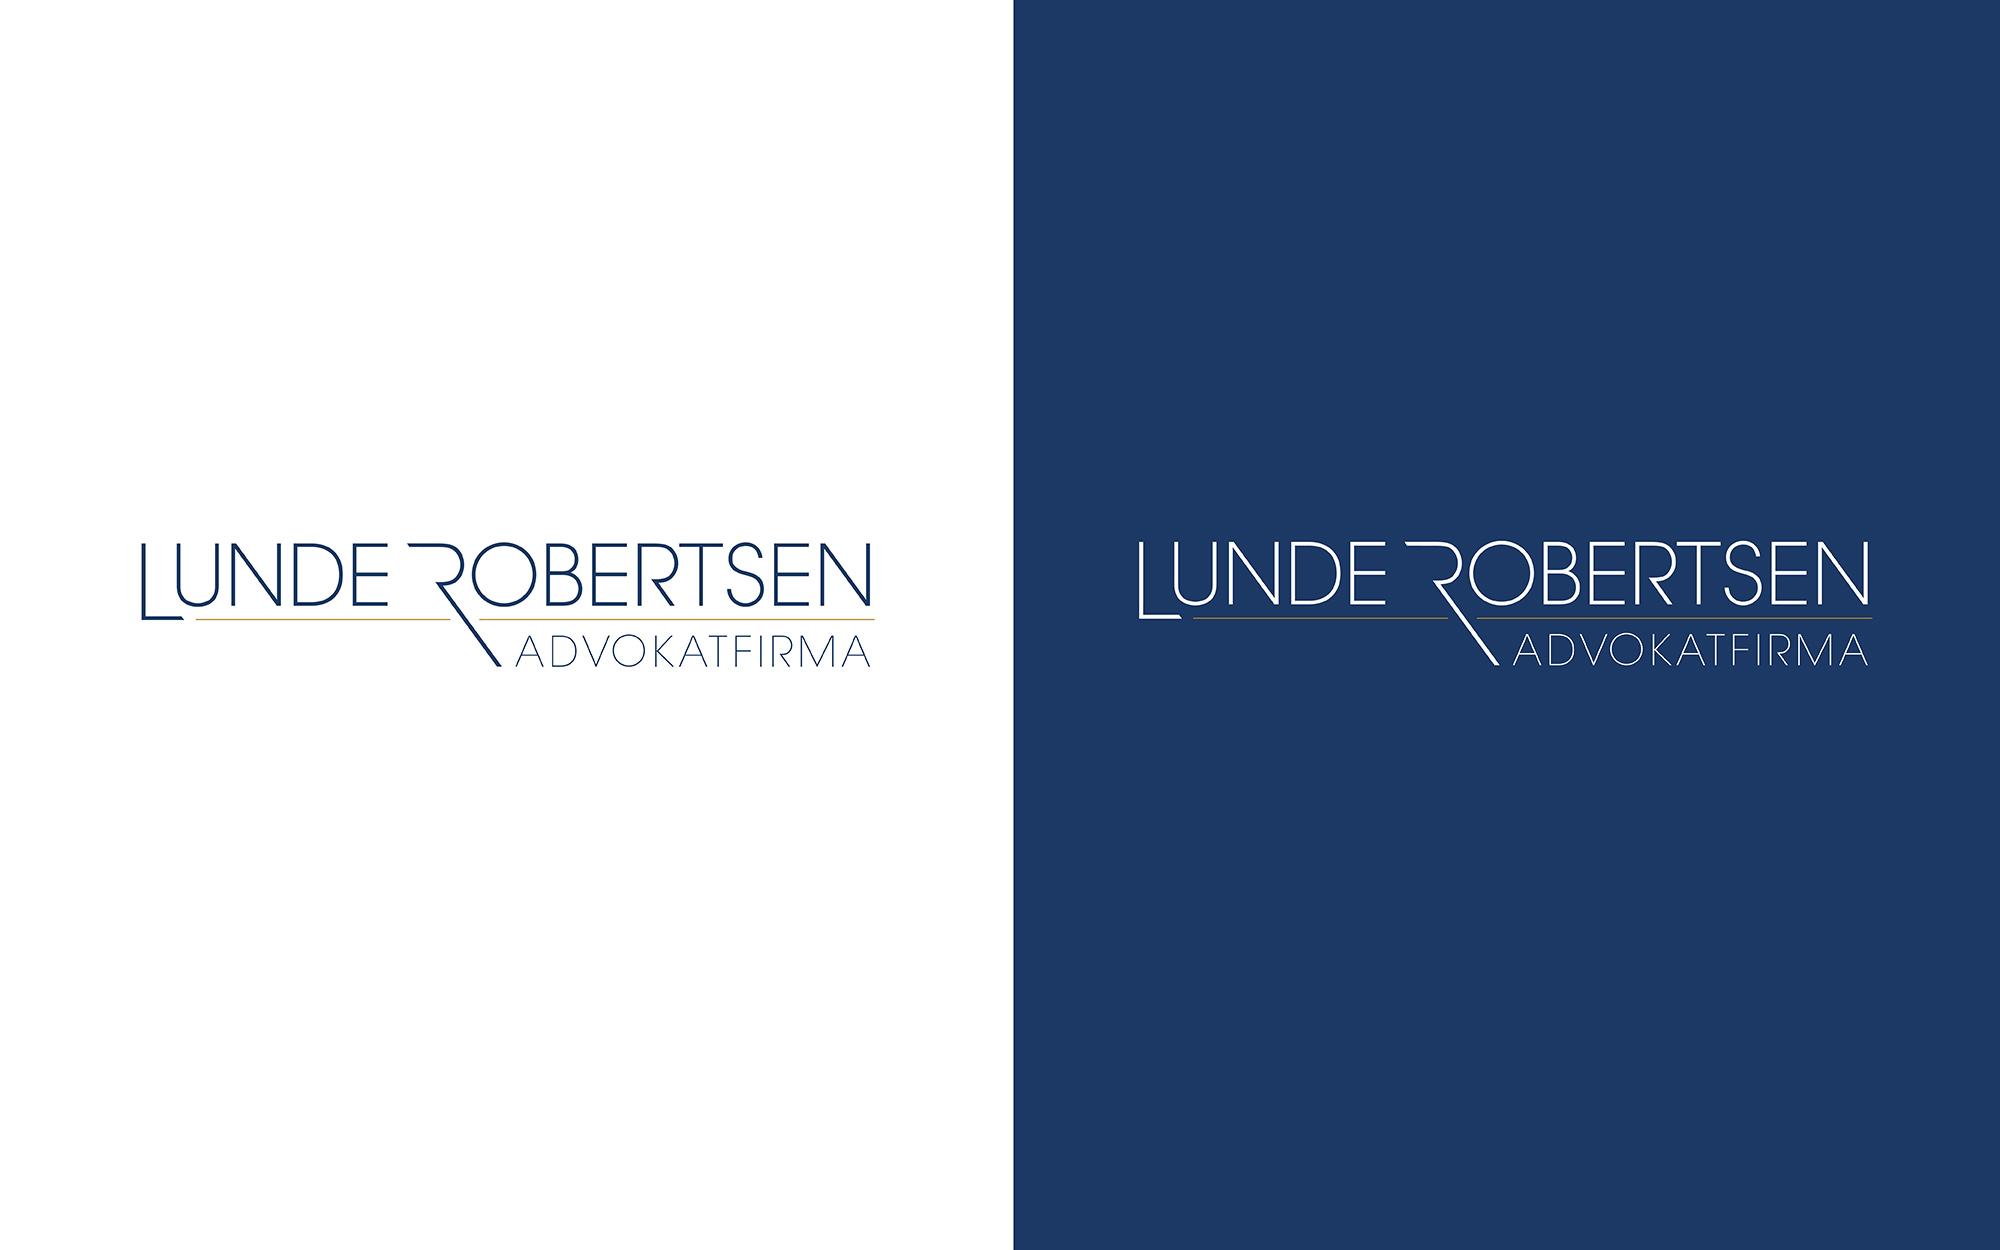 Lunde Robertsen logo